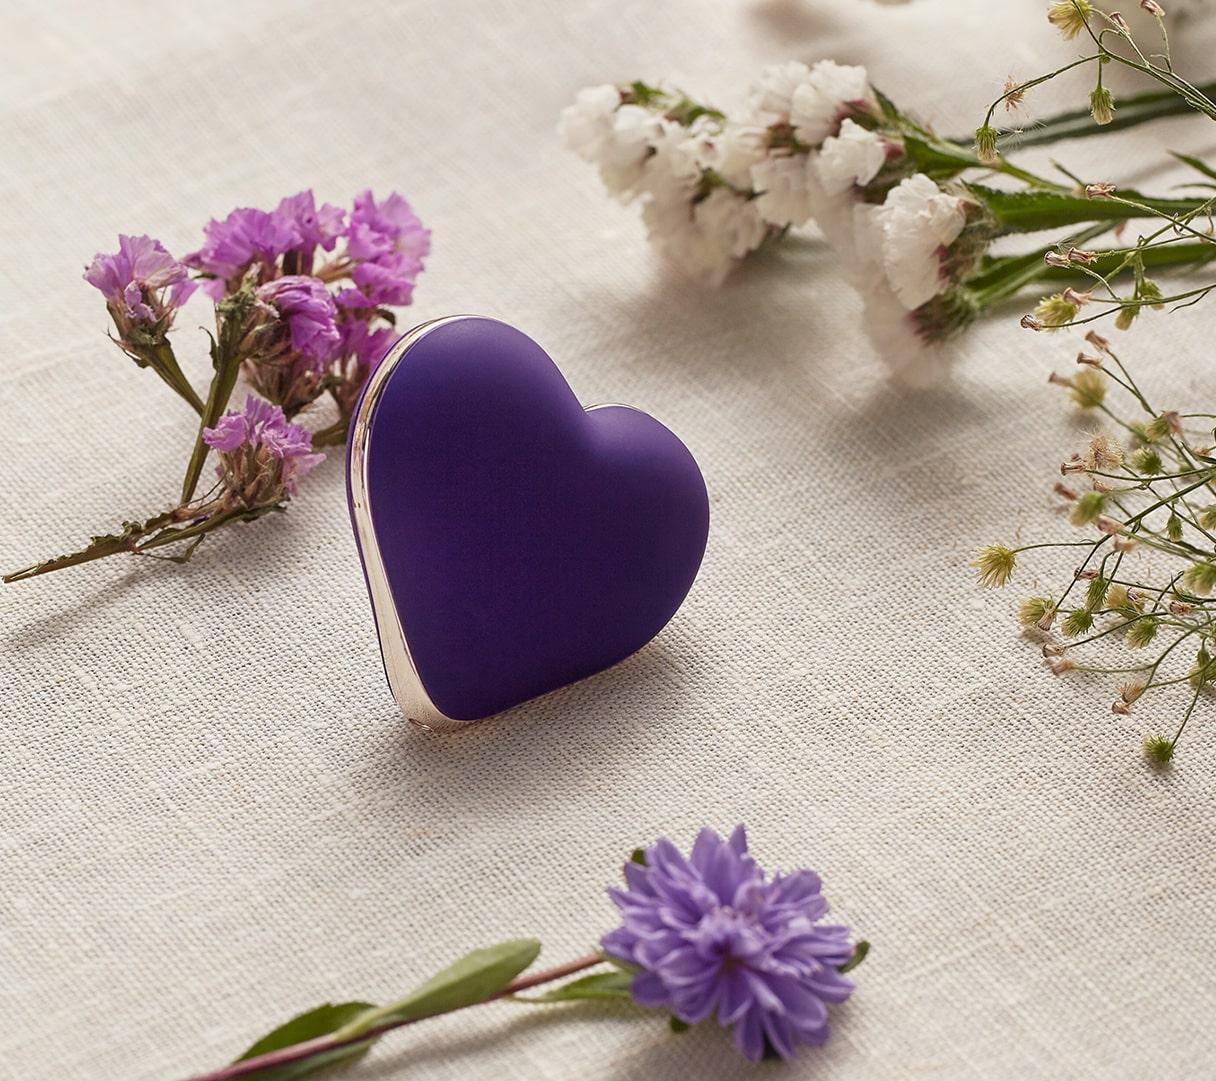 rianne s heart vibe wibrujace serduszko masazery lechtaczki 1b